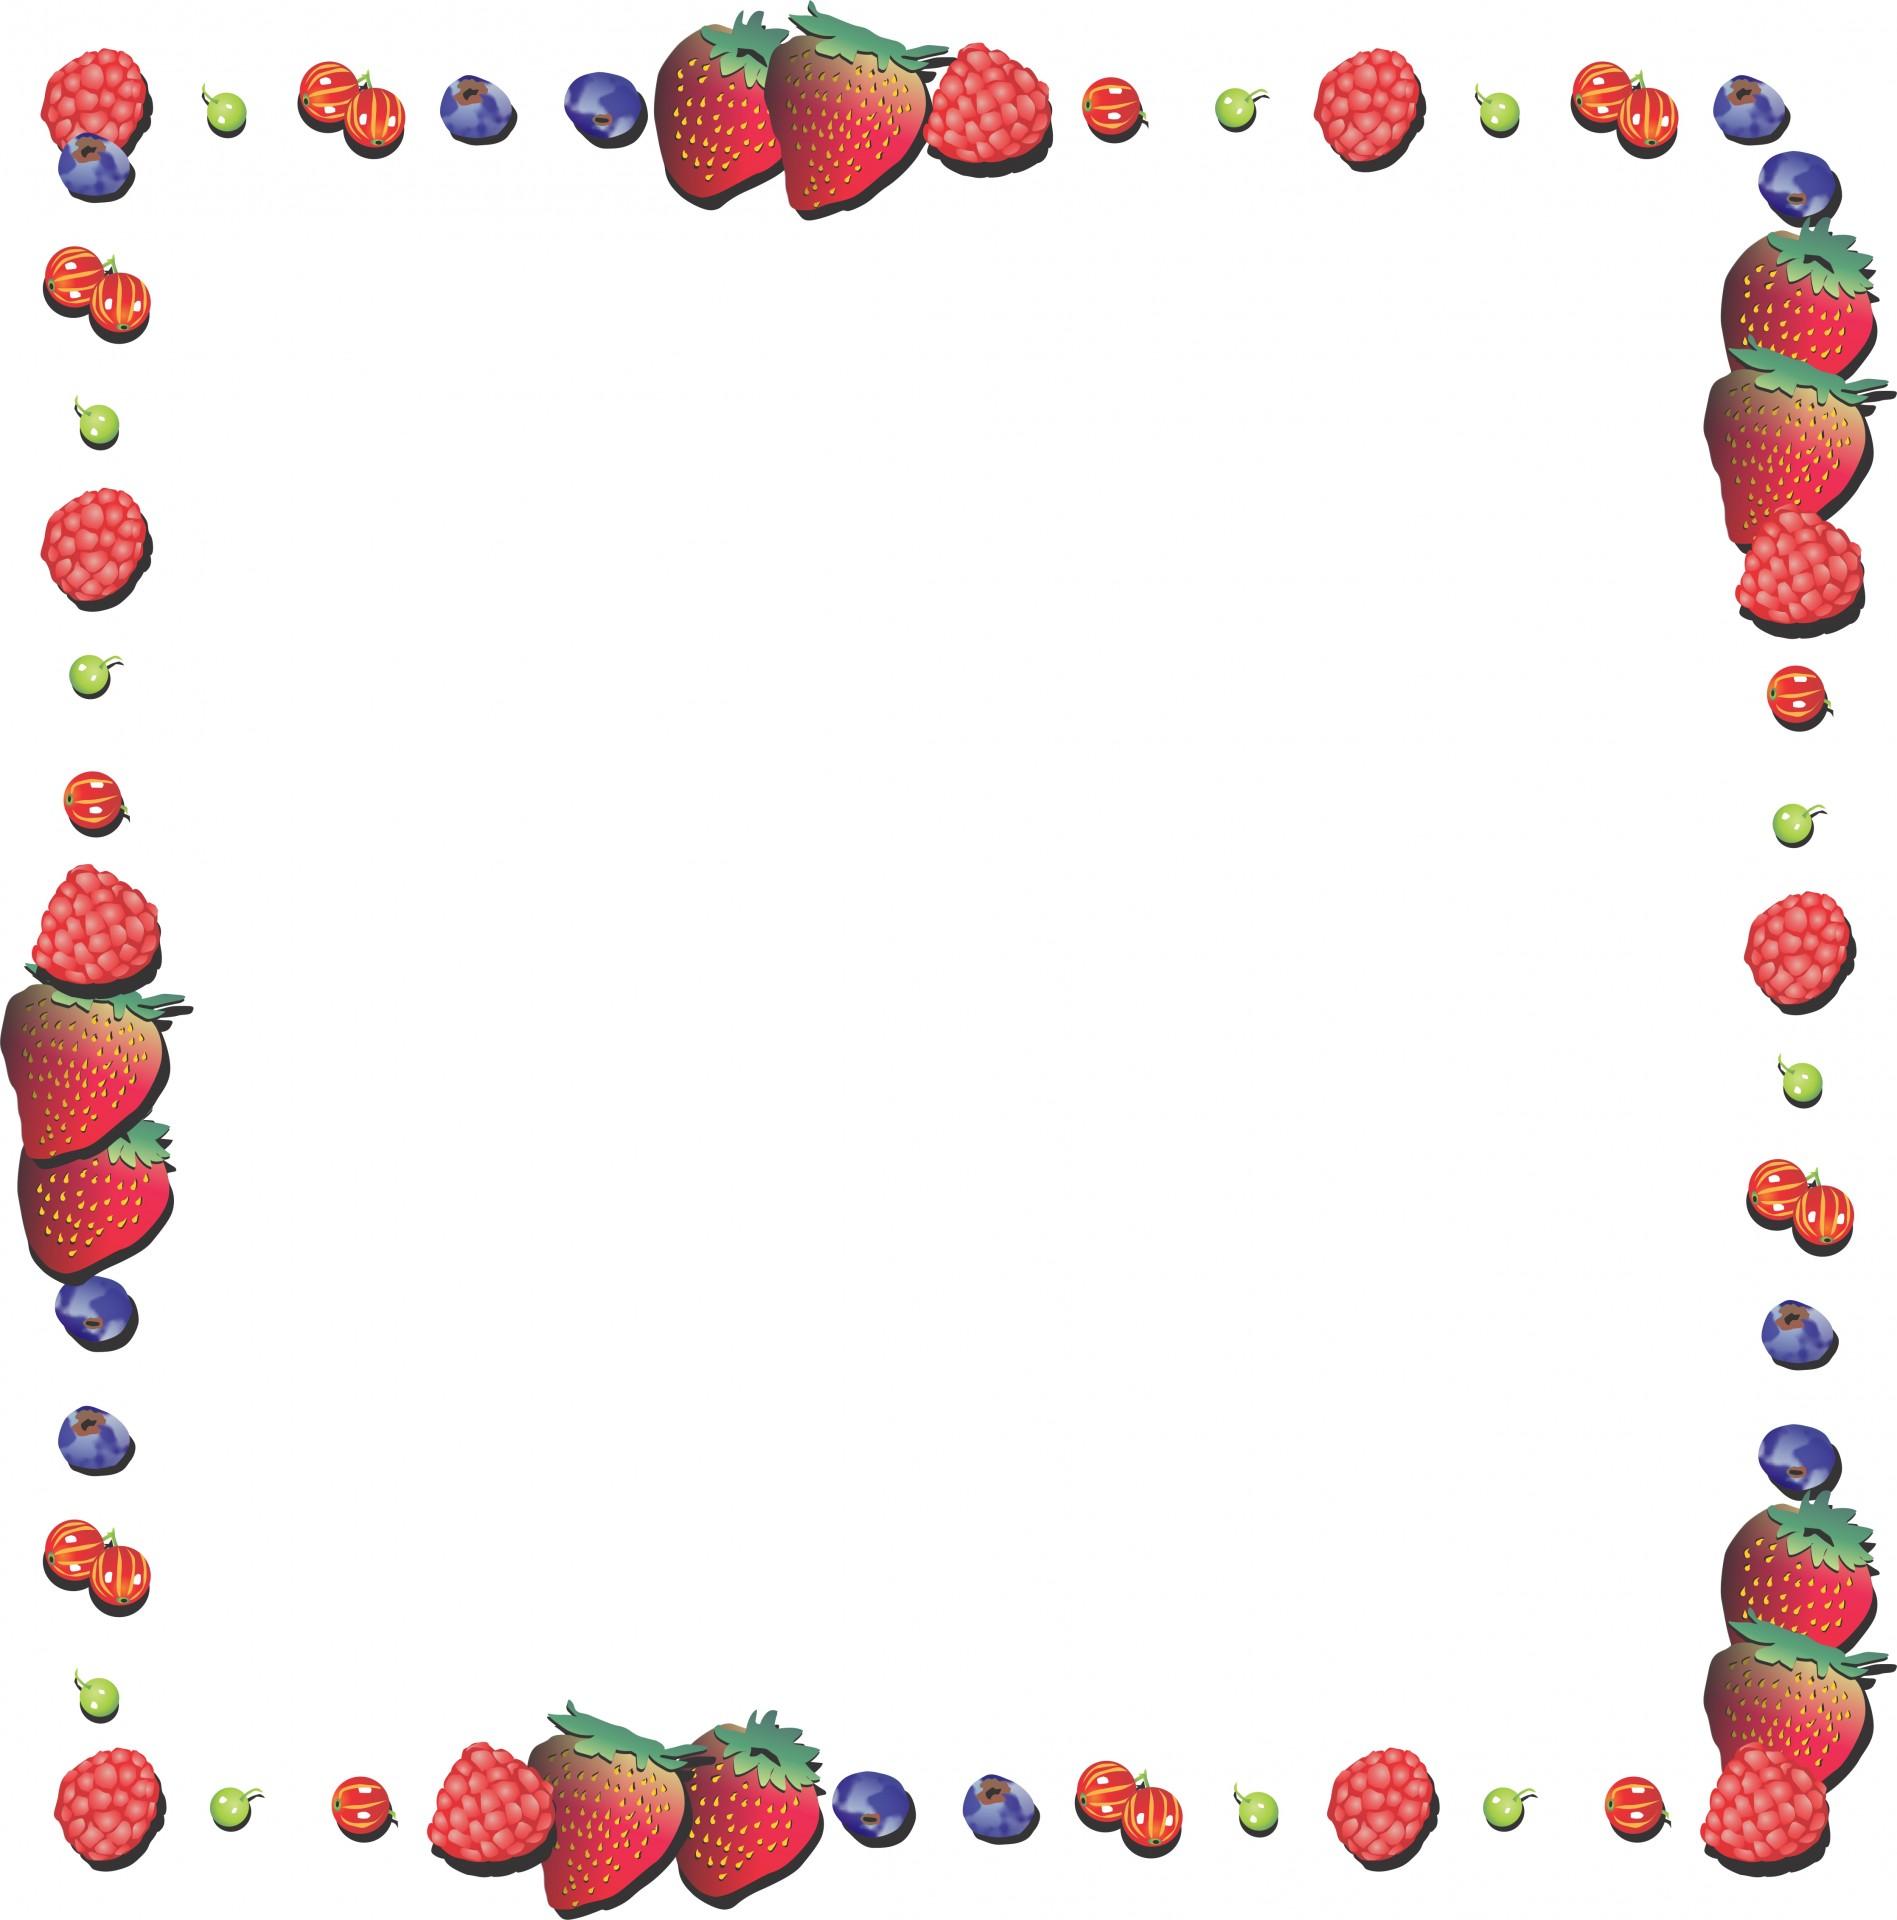 Strawberry Frame Free Stock Photo